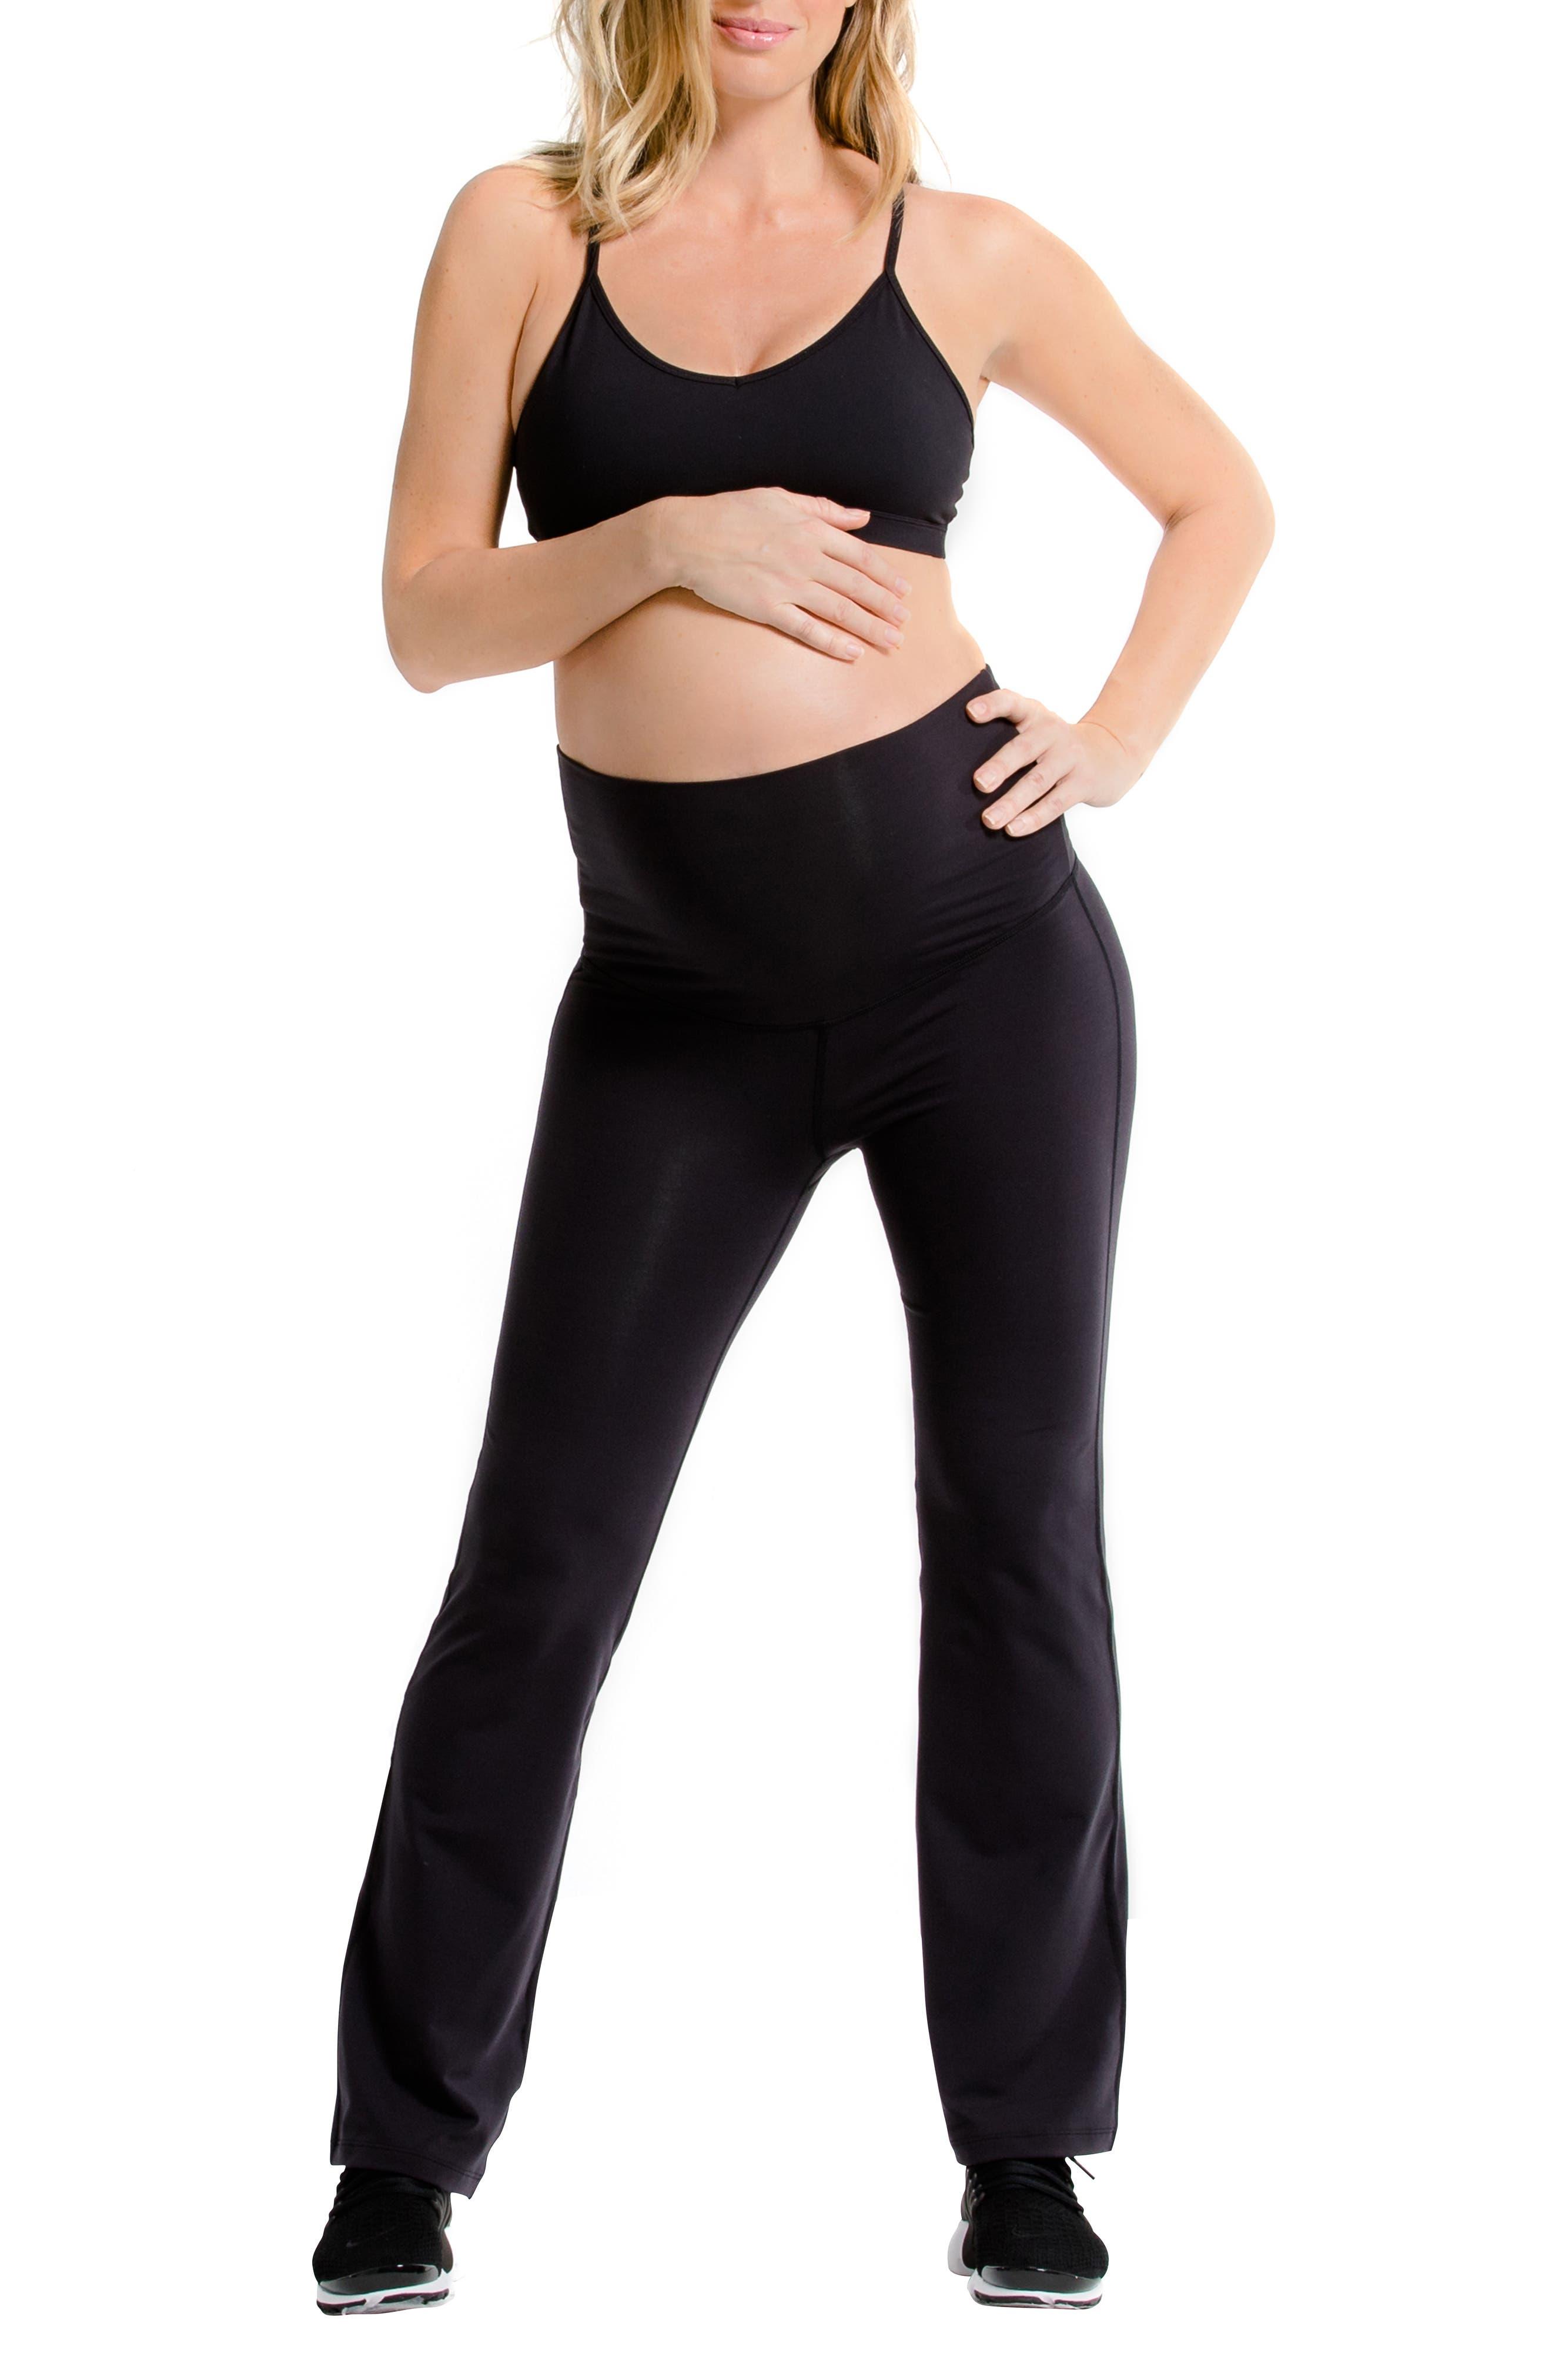 AMARI, Wanderlust Maternity Pants, Main thumbnail 1, color, BLACK